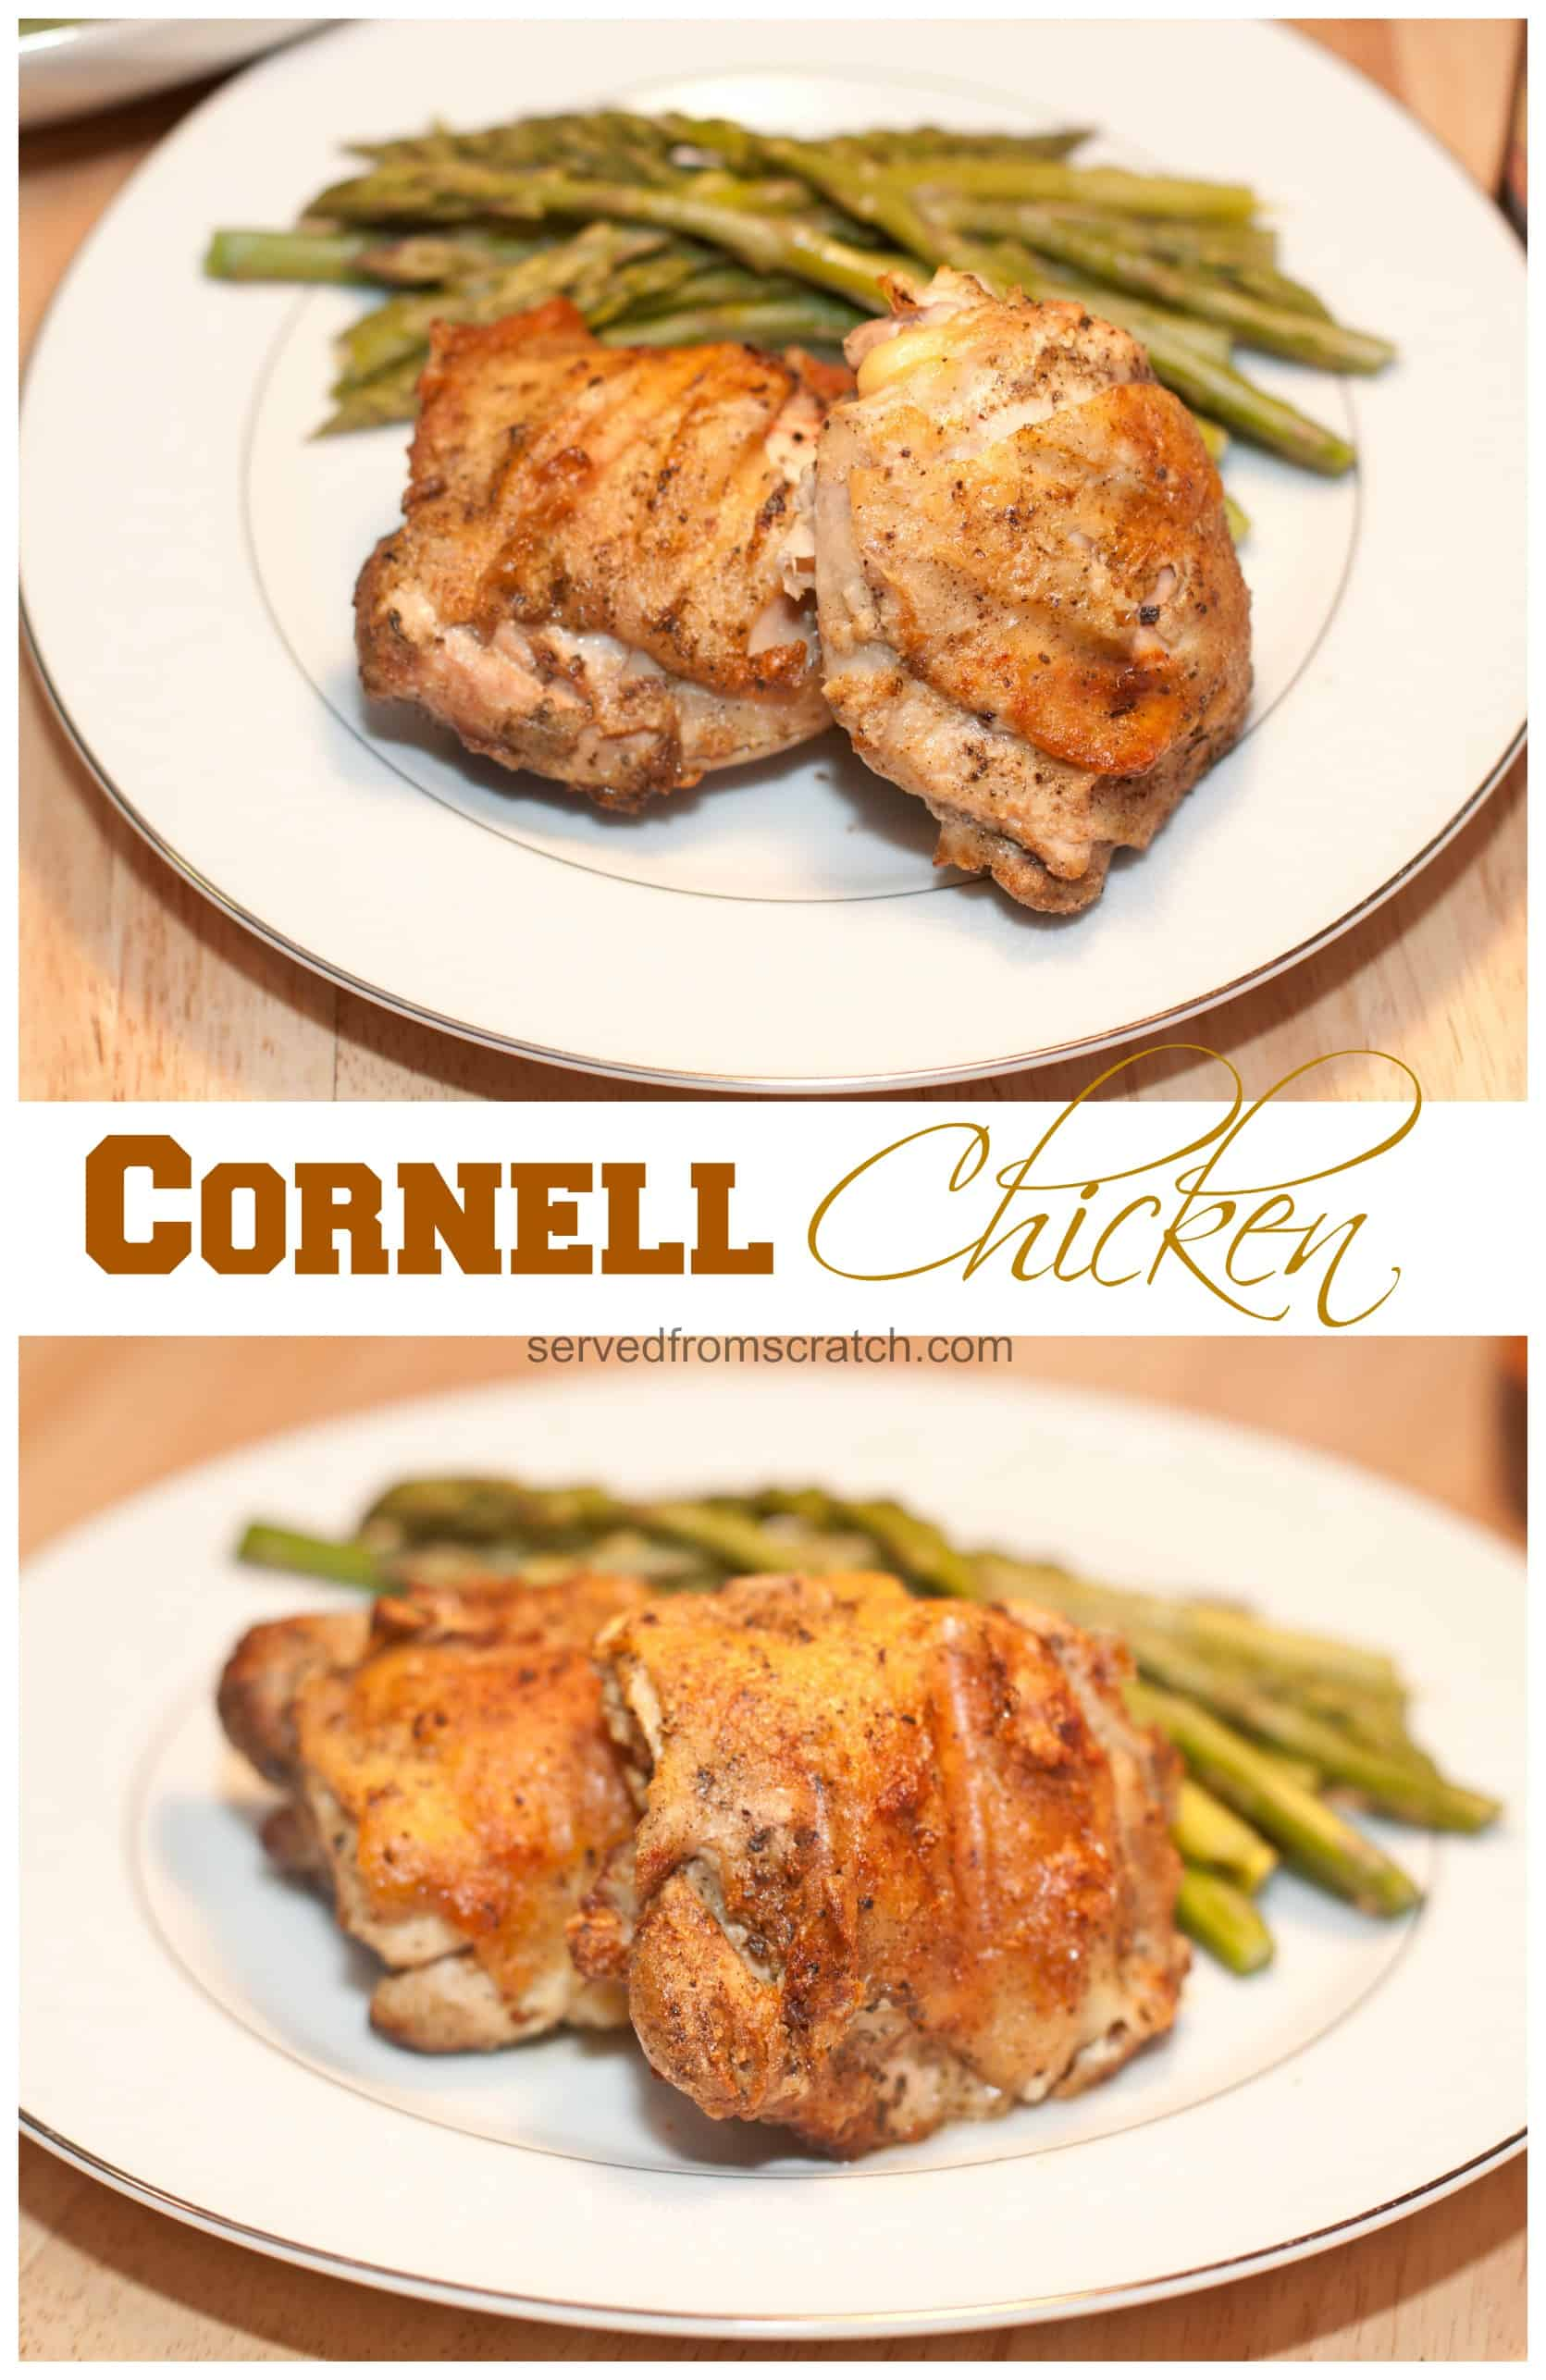 Cornell Chicken - Served From Scratch